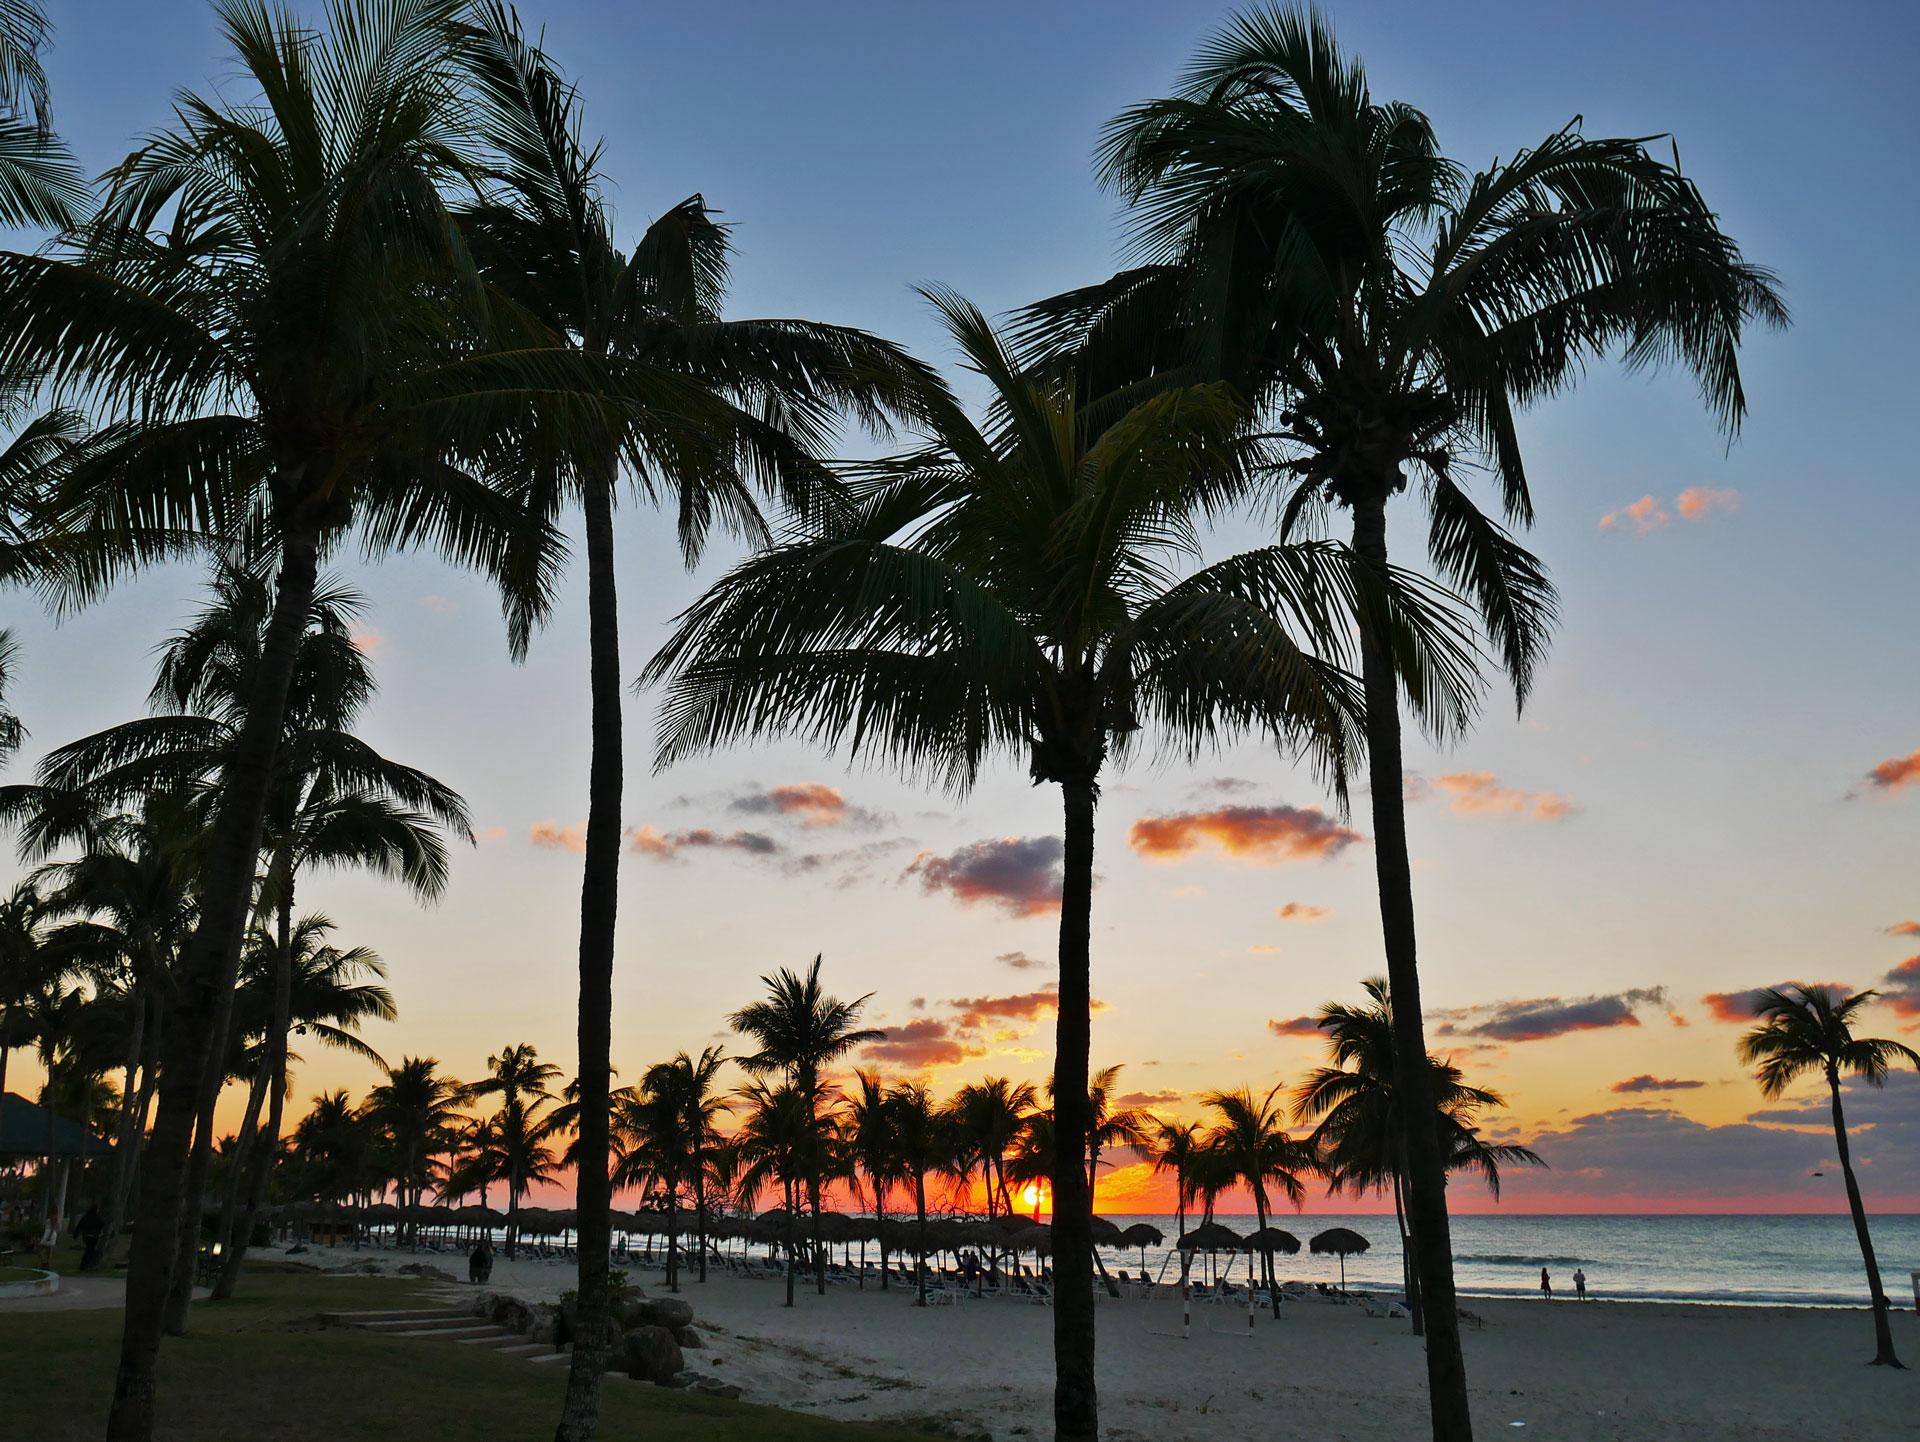 Sunset sky and palm trees at Varadero beach, Cuba